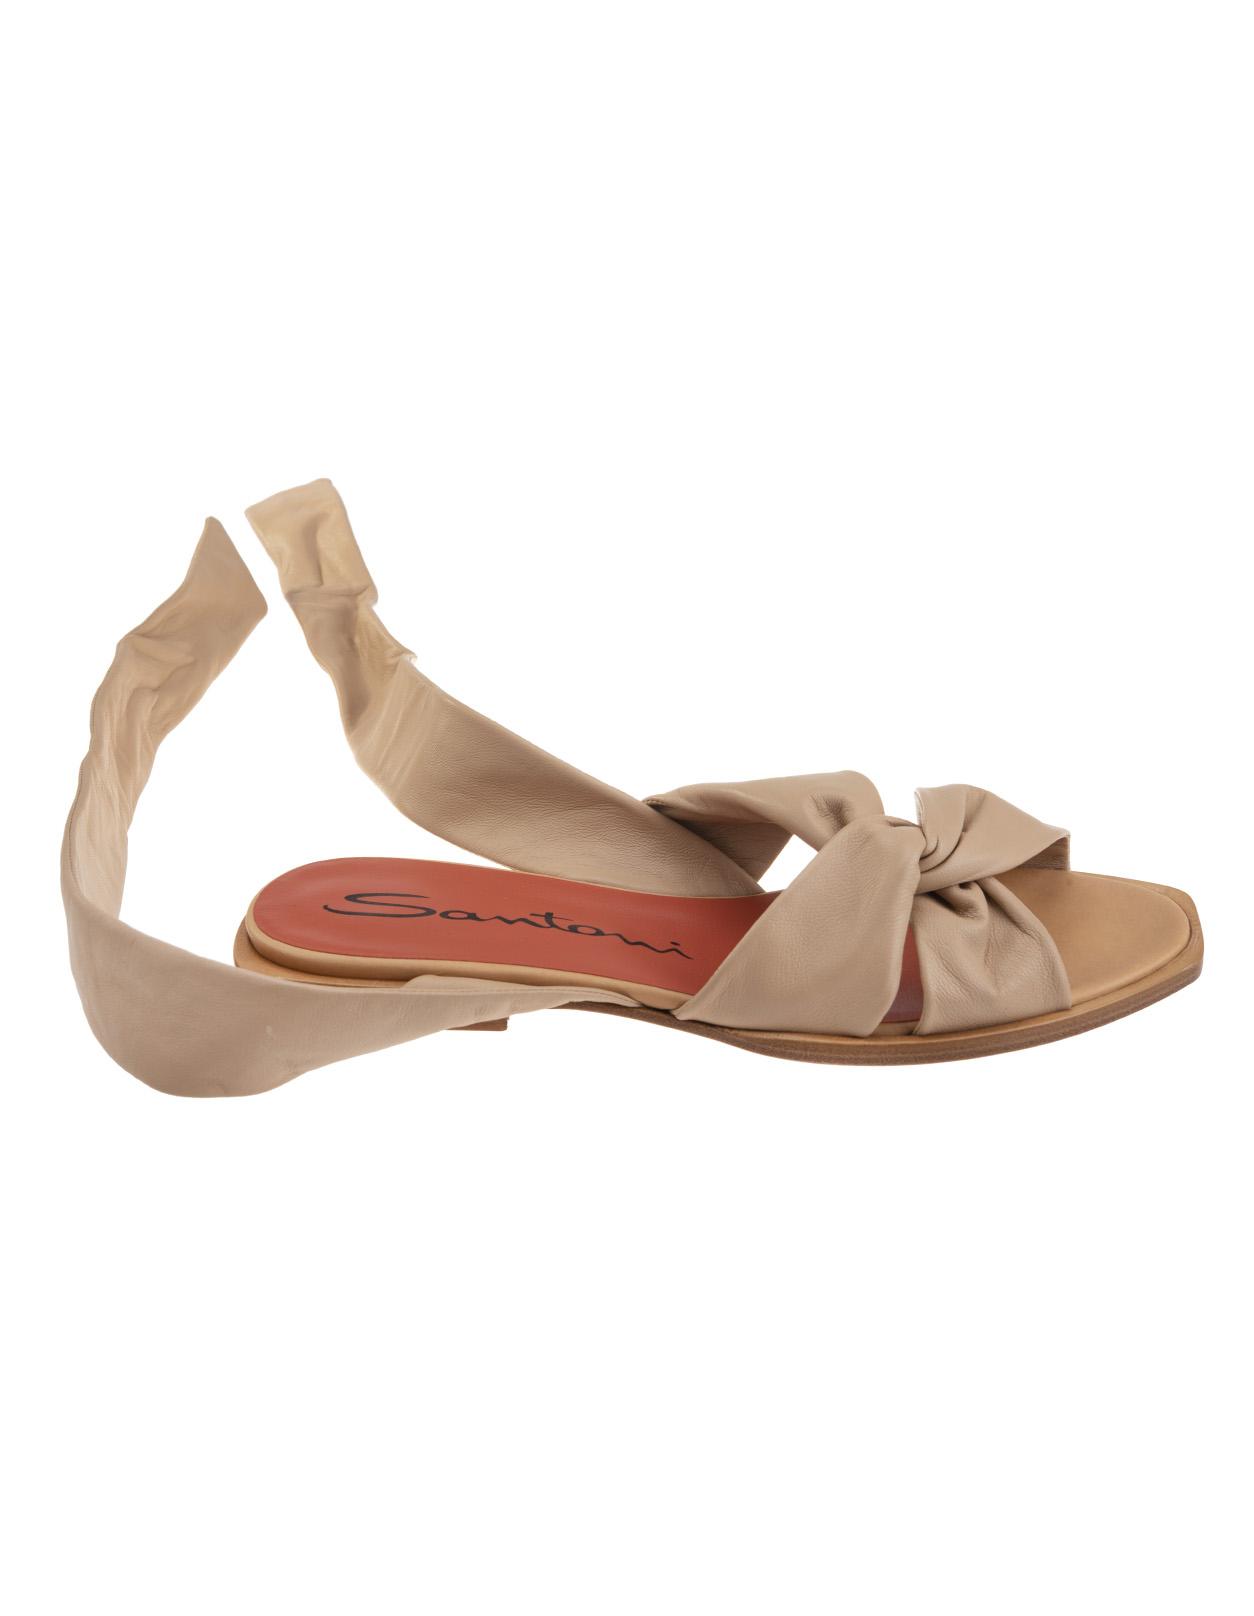 1ba74a0ba760 Beige Low Sandal With Woven Detail - SANTONI - Russocapri